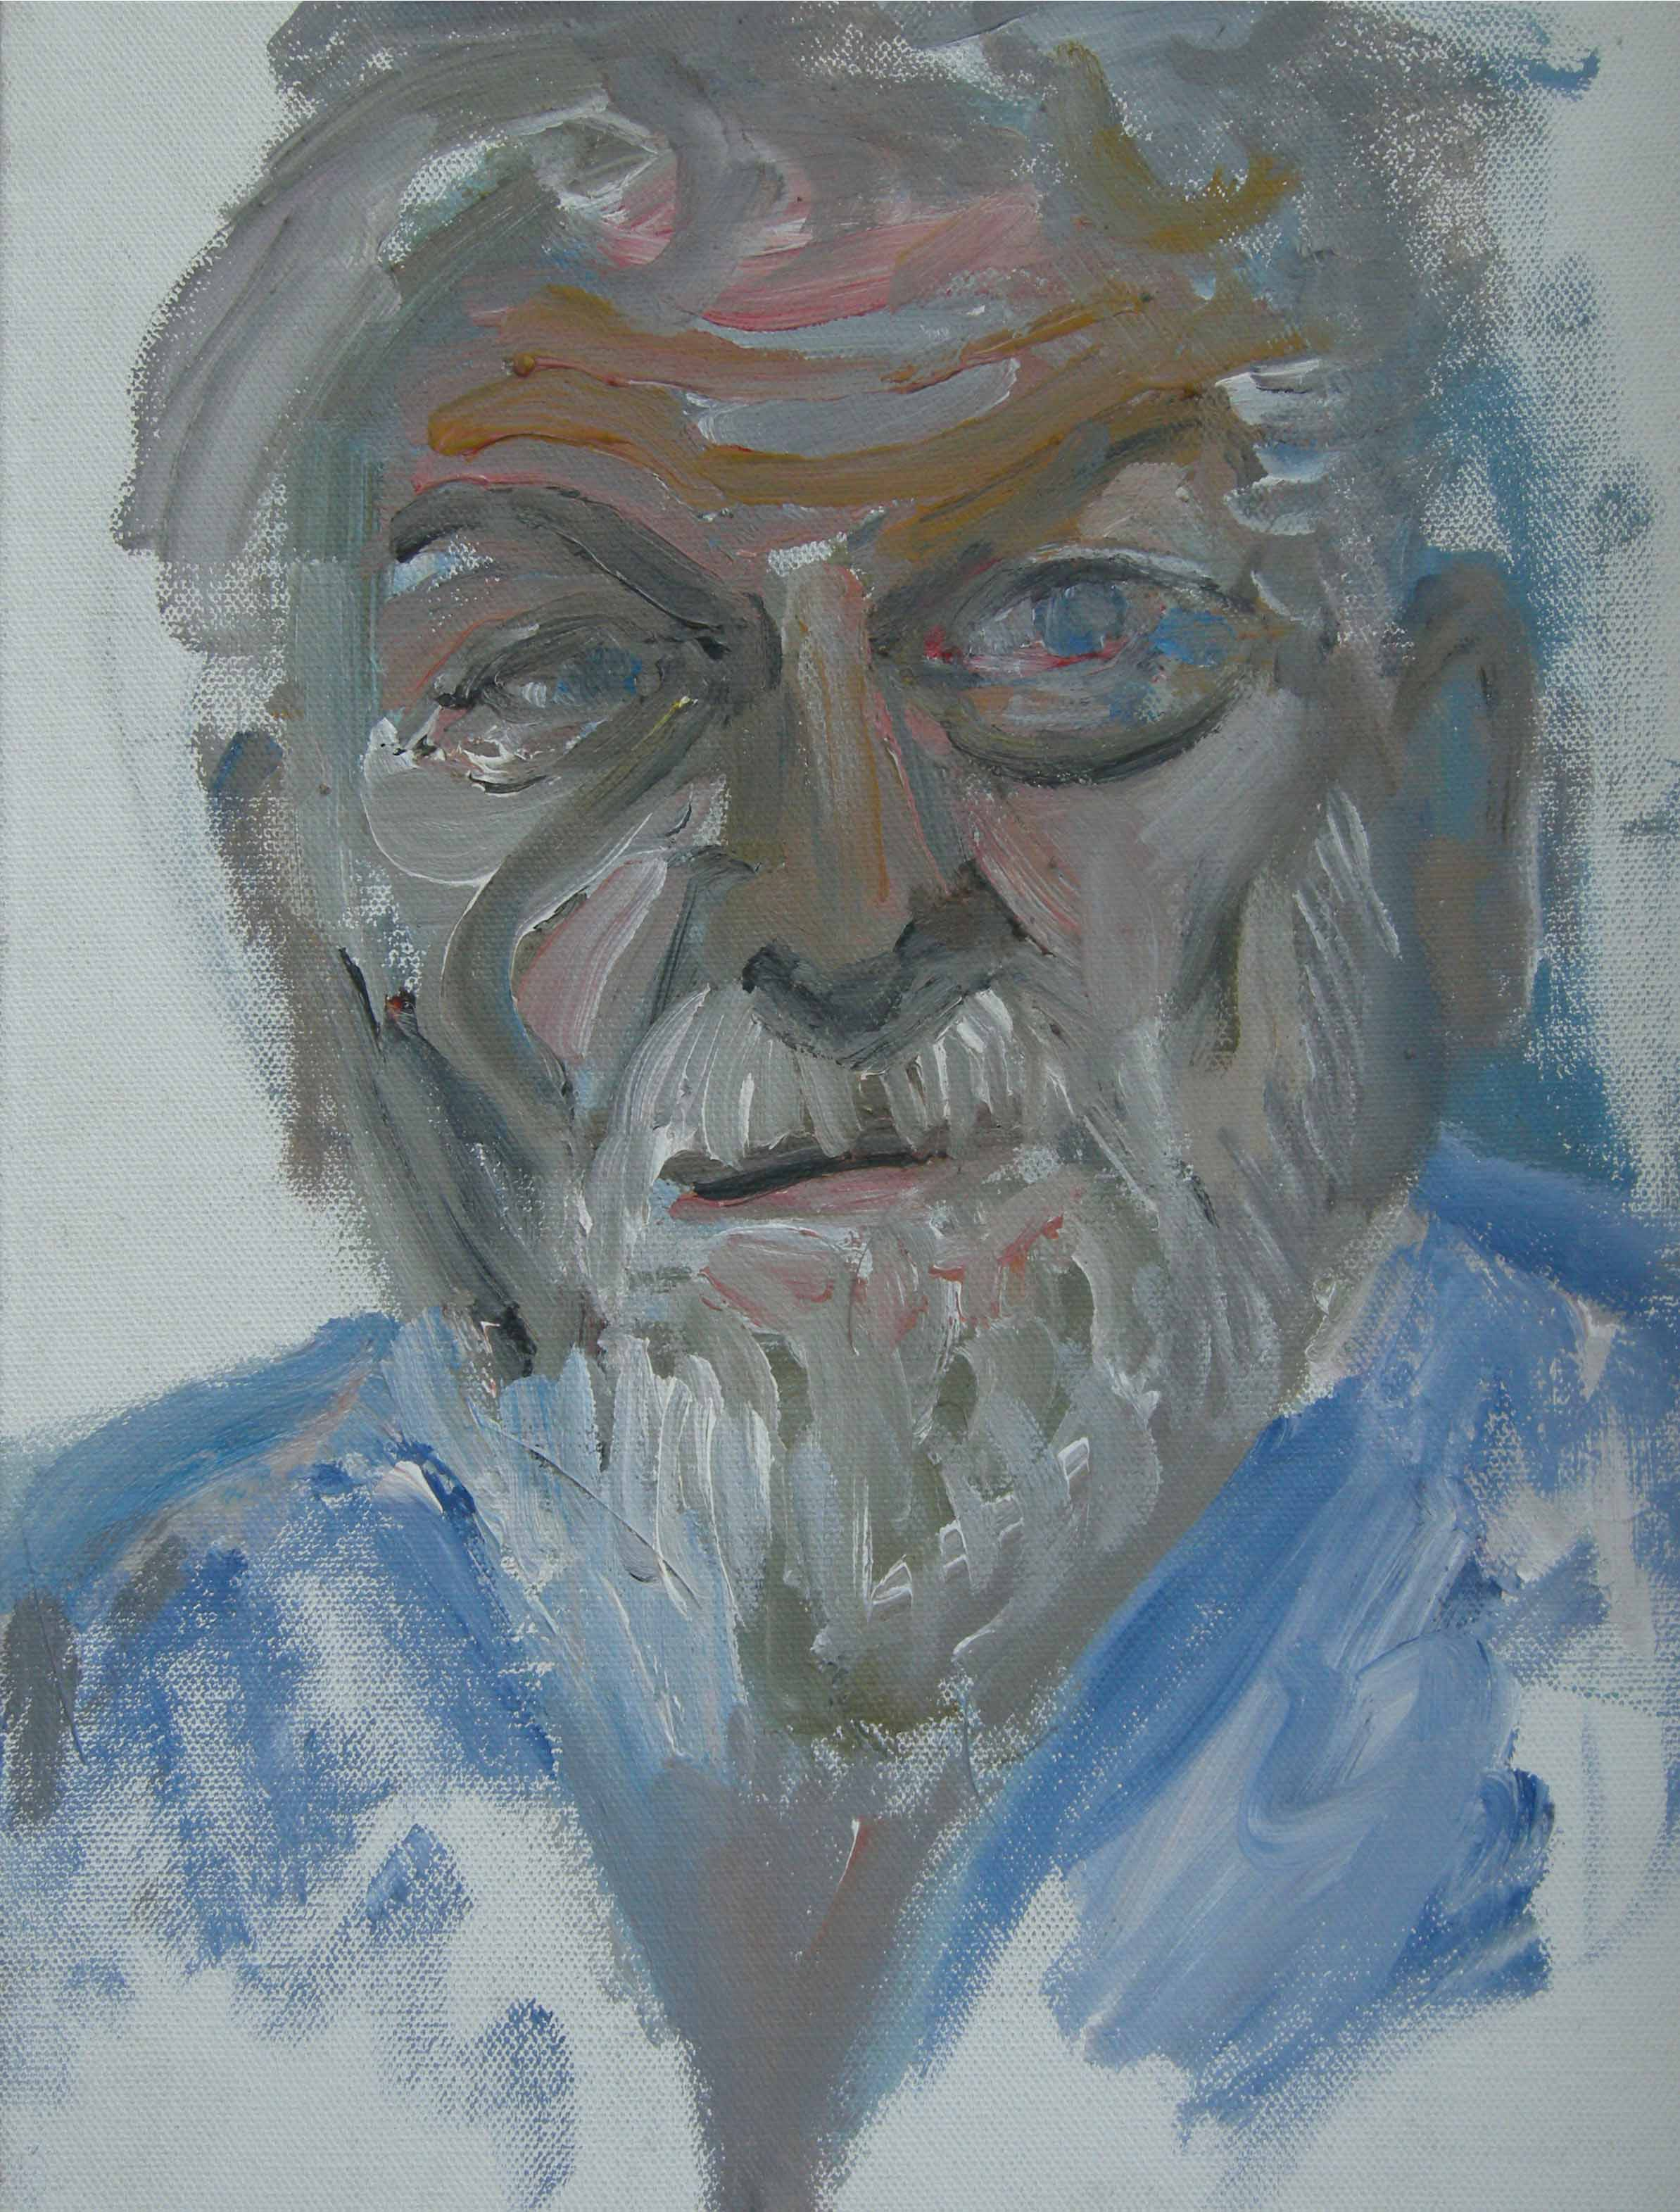 ARTIST RAUL HERRERA  Acrylic on Canvas Board   35 x 25 cm   2013